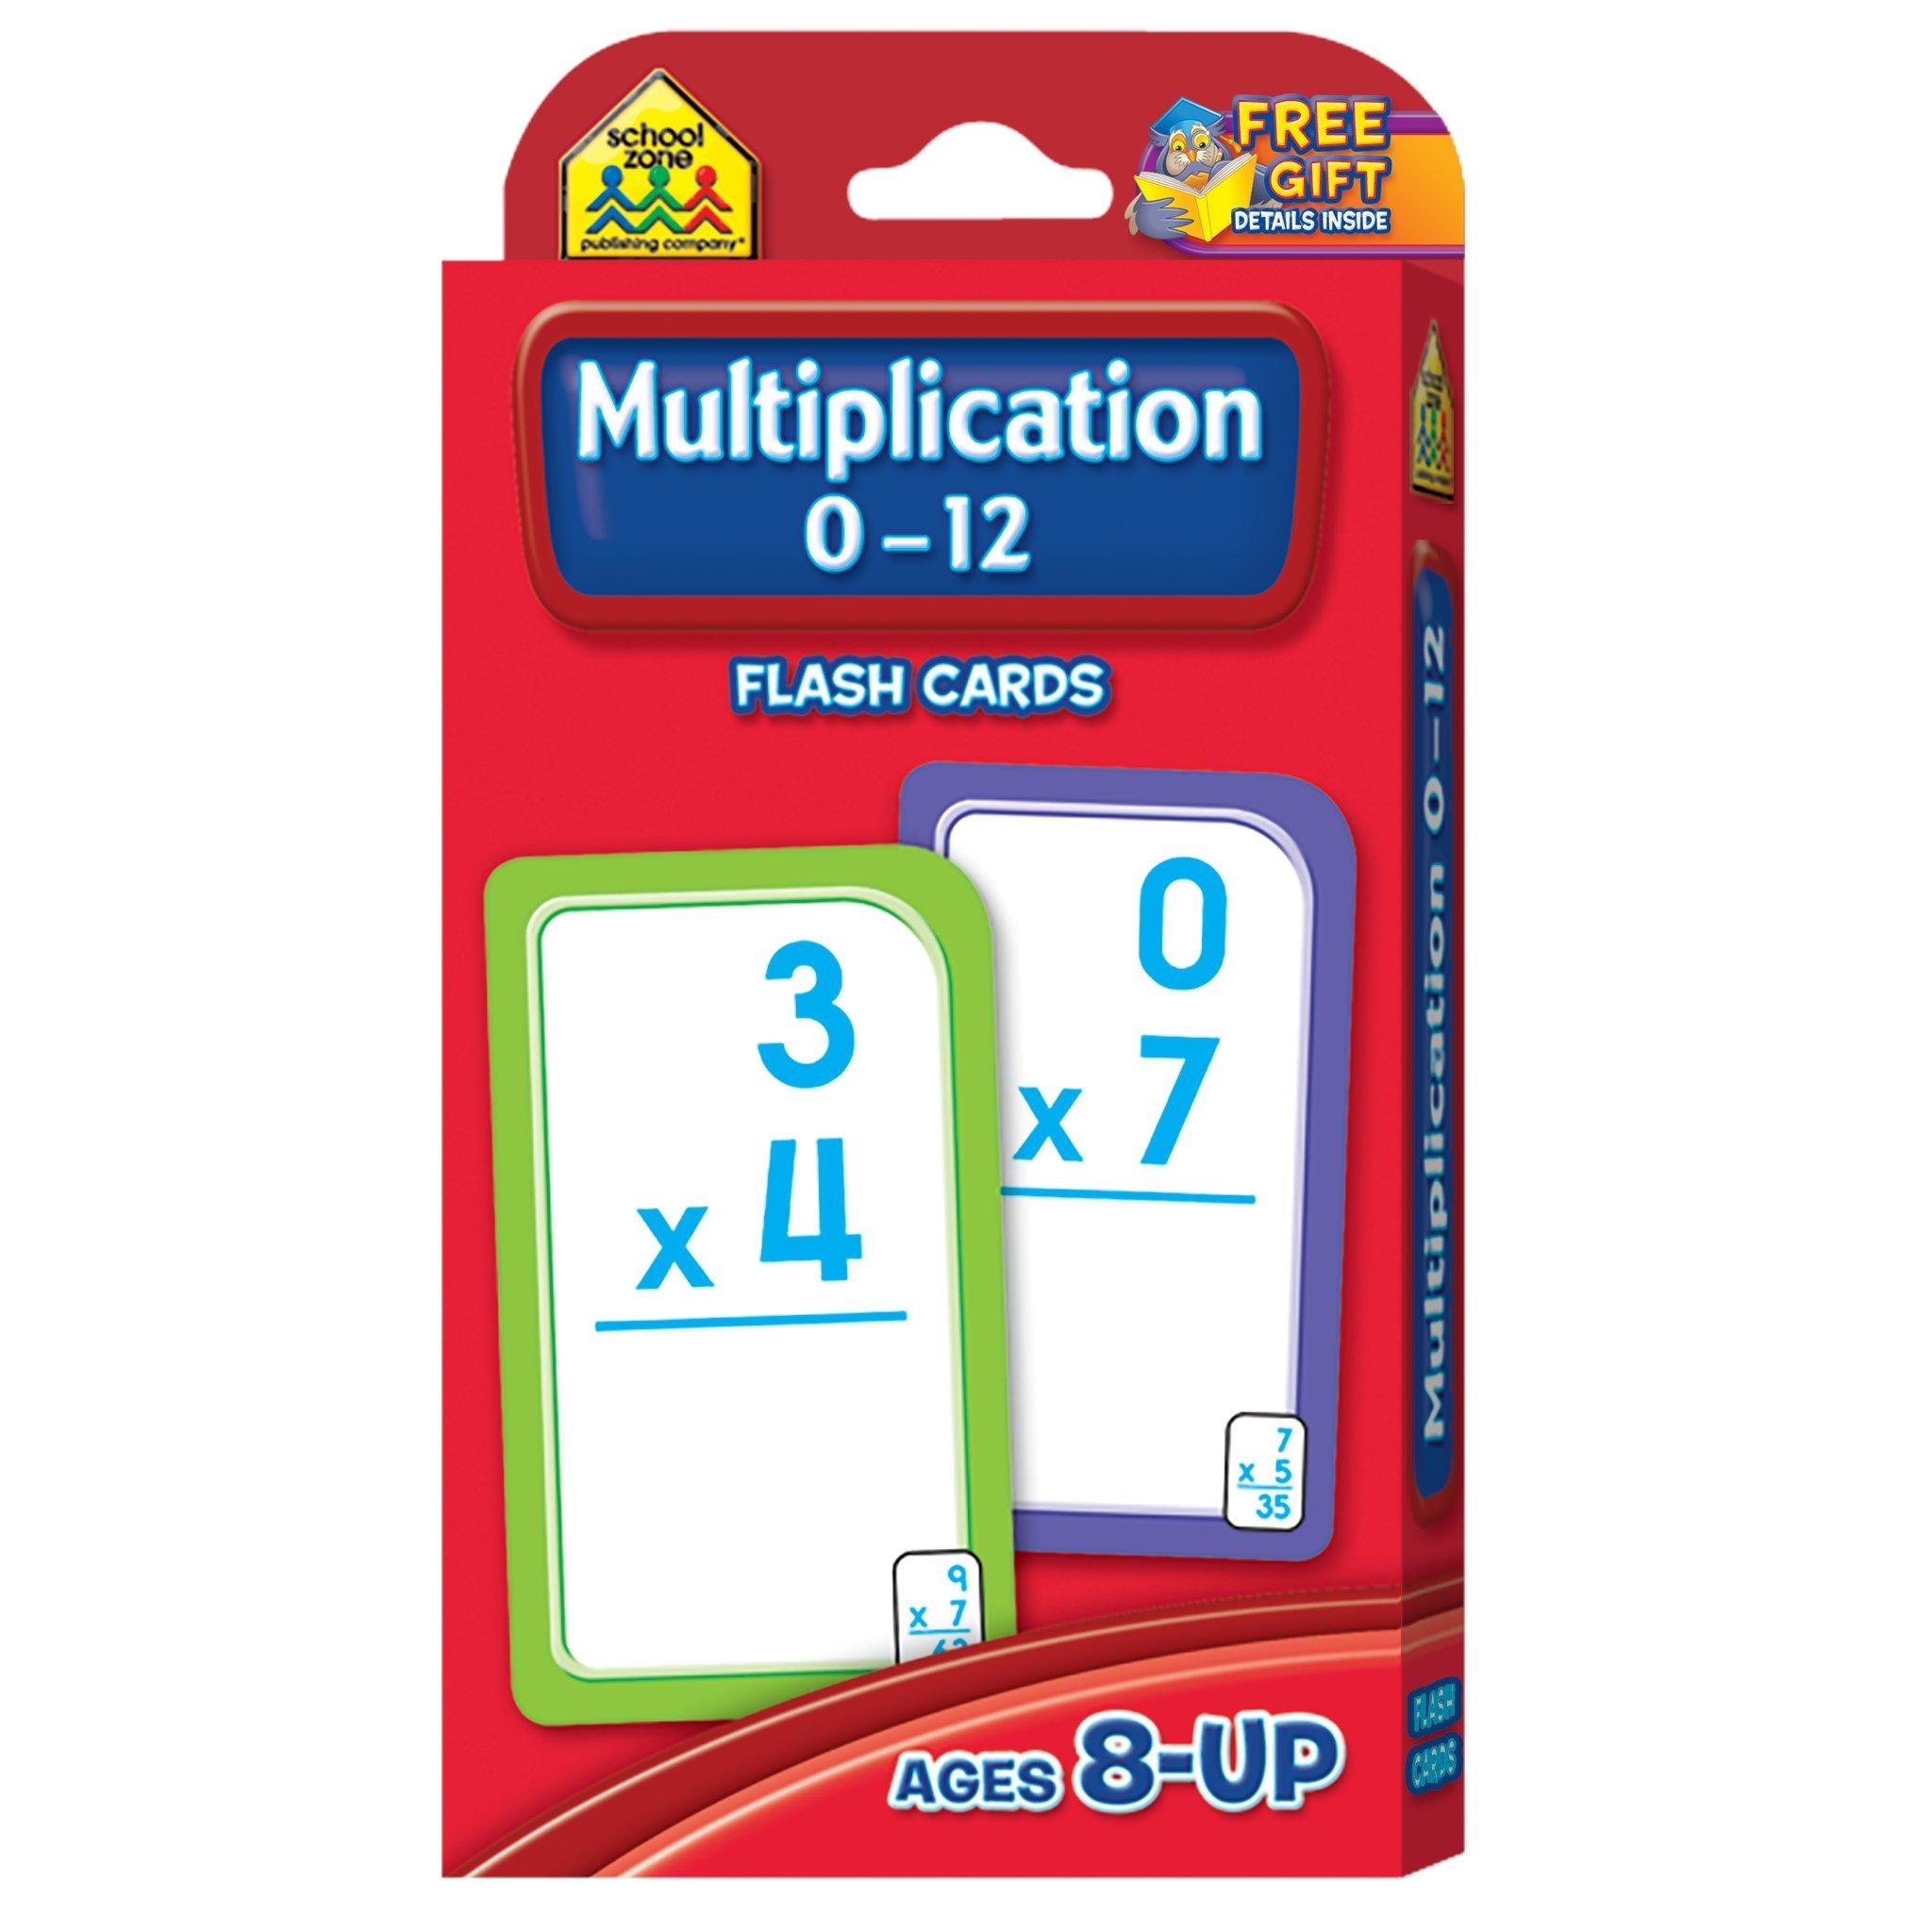 Multiplication 0-12 Flash Cards: School Zone Publishing Company ...